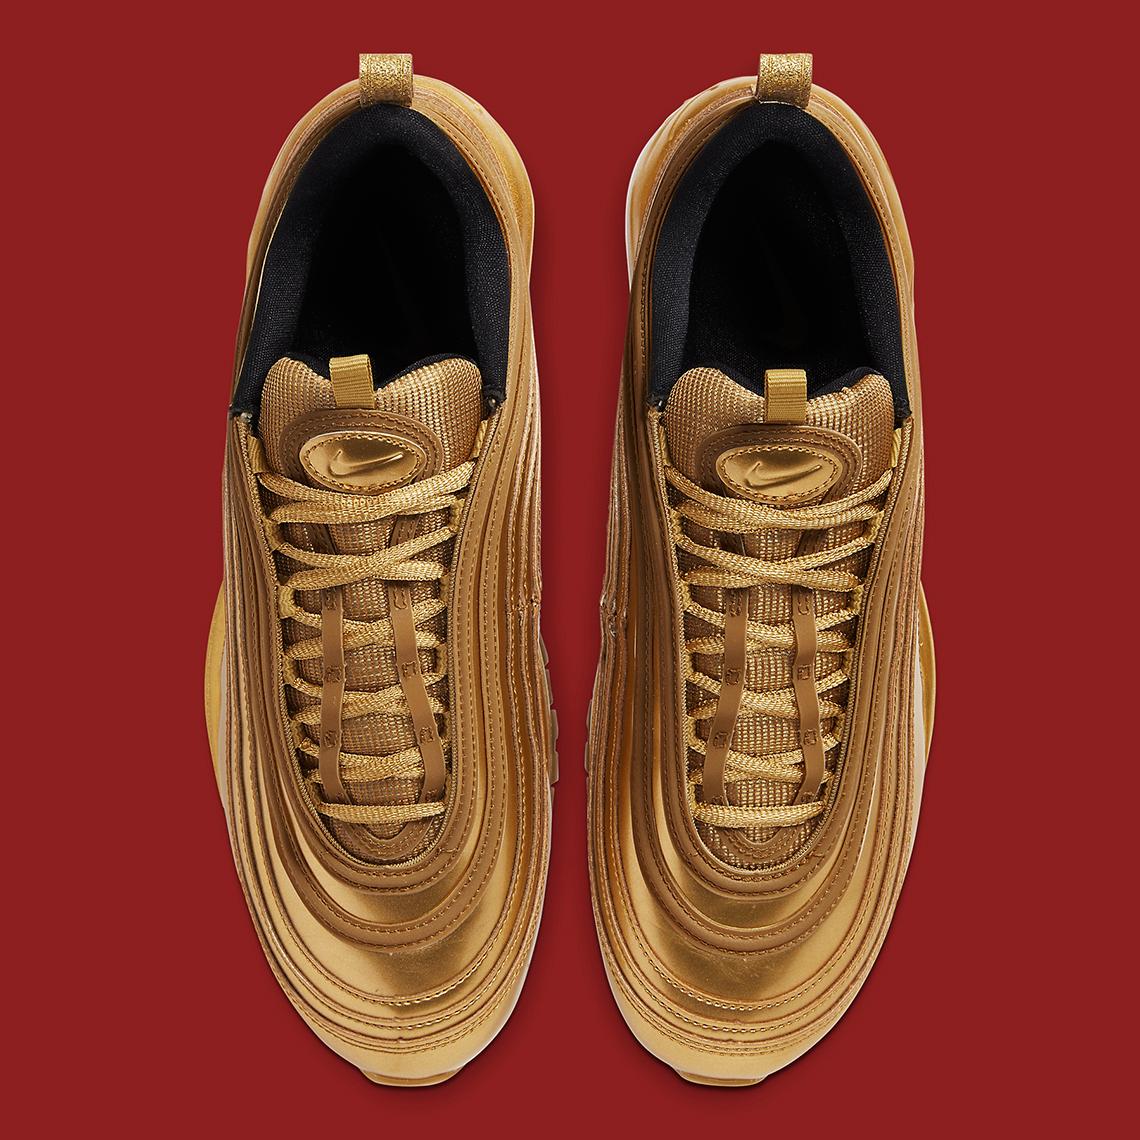 Nike Air Max 97 Metallic Gold CT4556 700 |